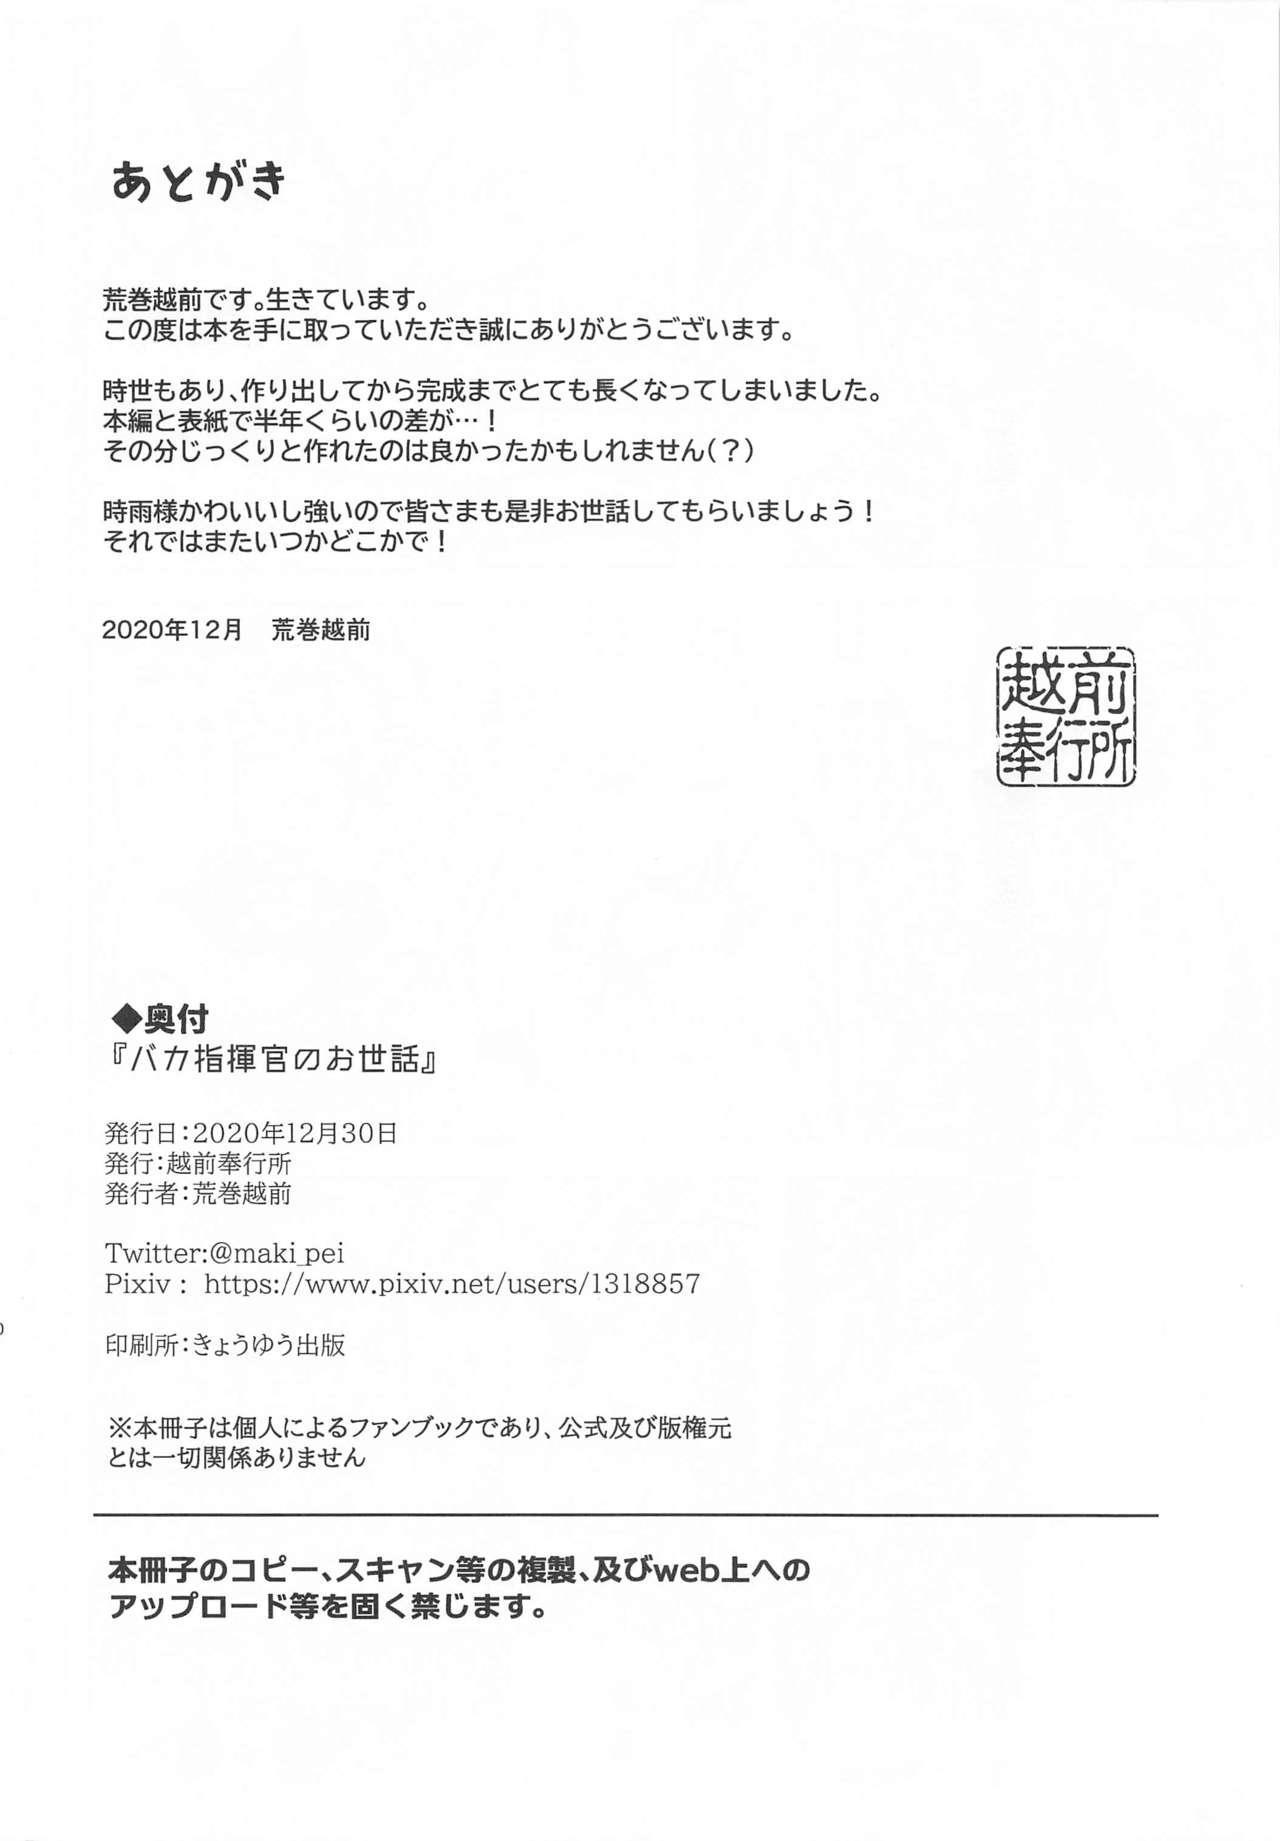 Baka Shikikan no Osewa 20